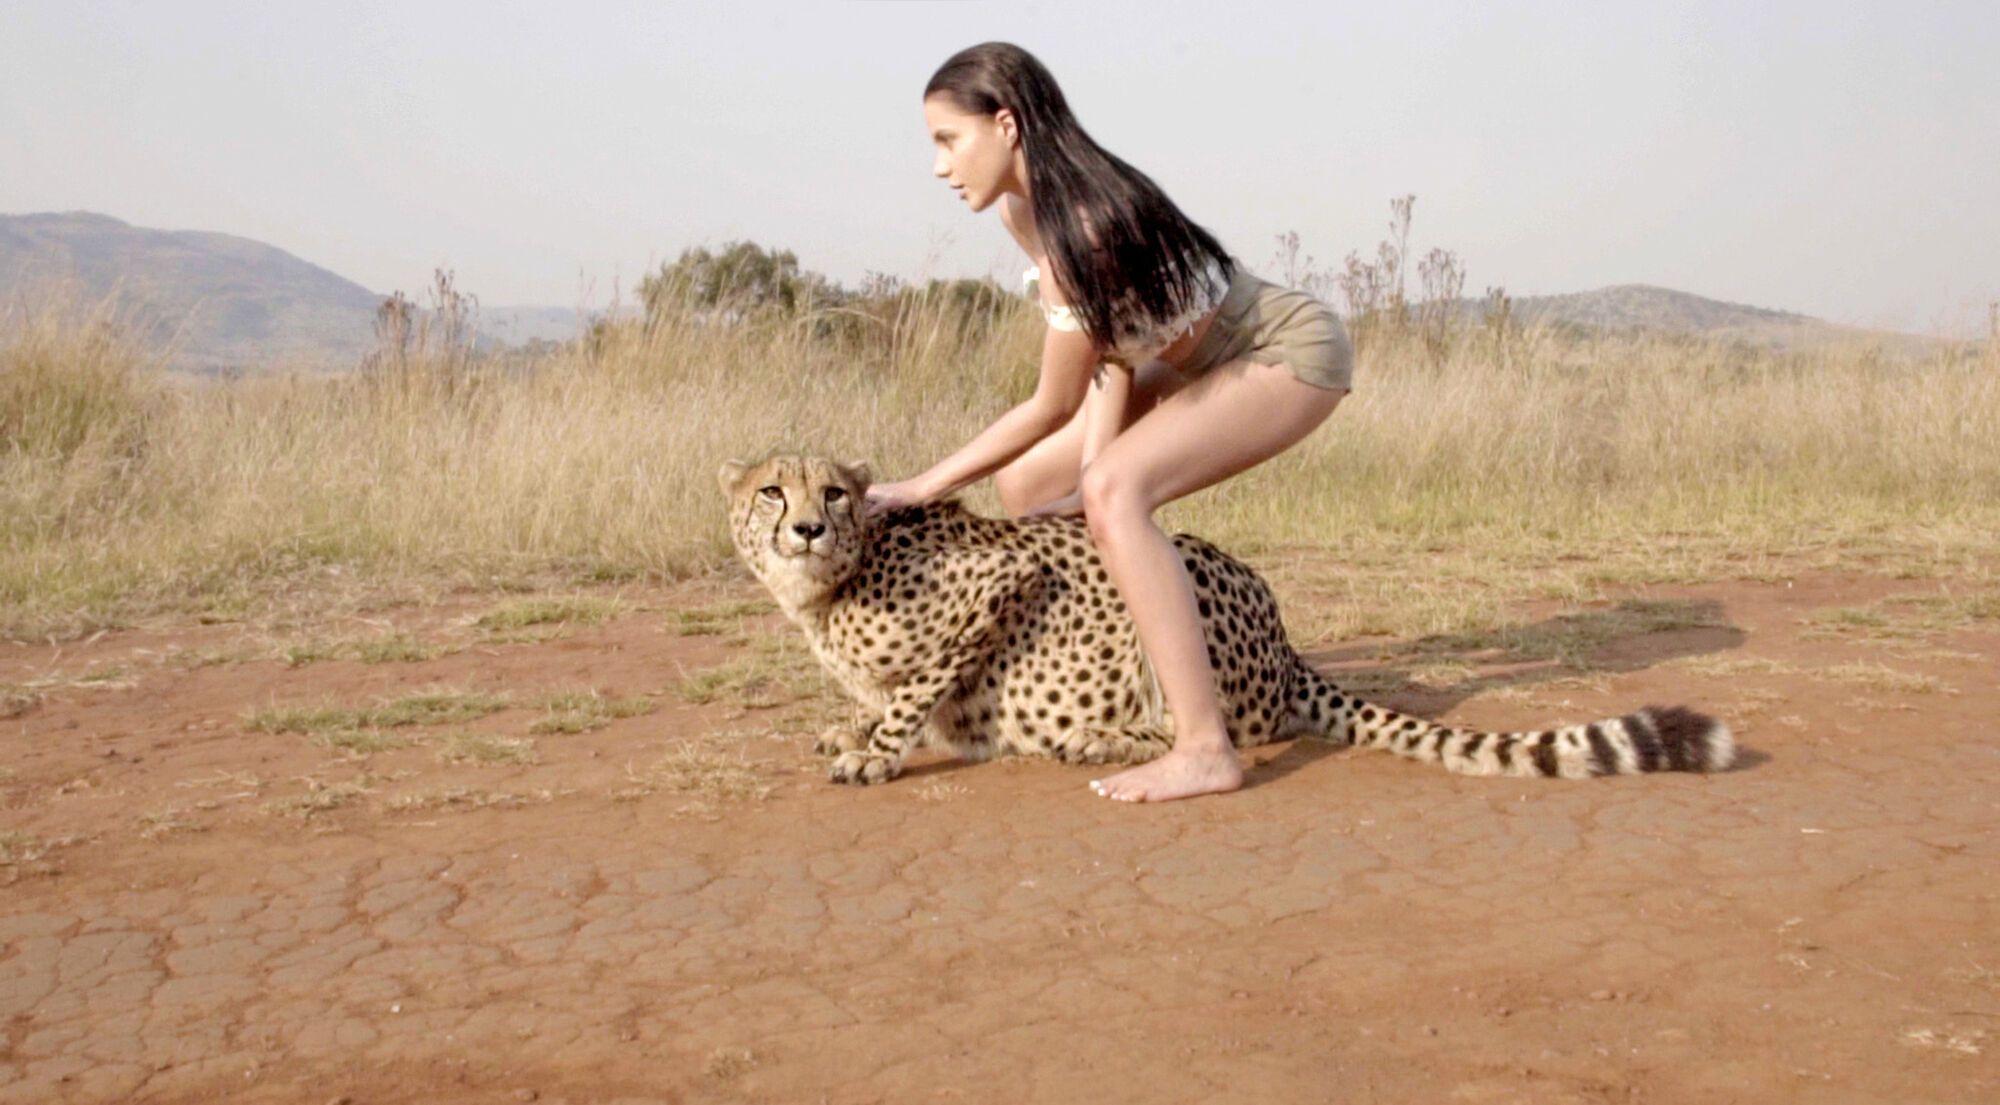 Wicked topless cheetah girl shirt